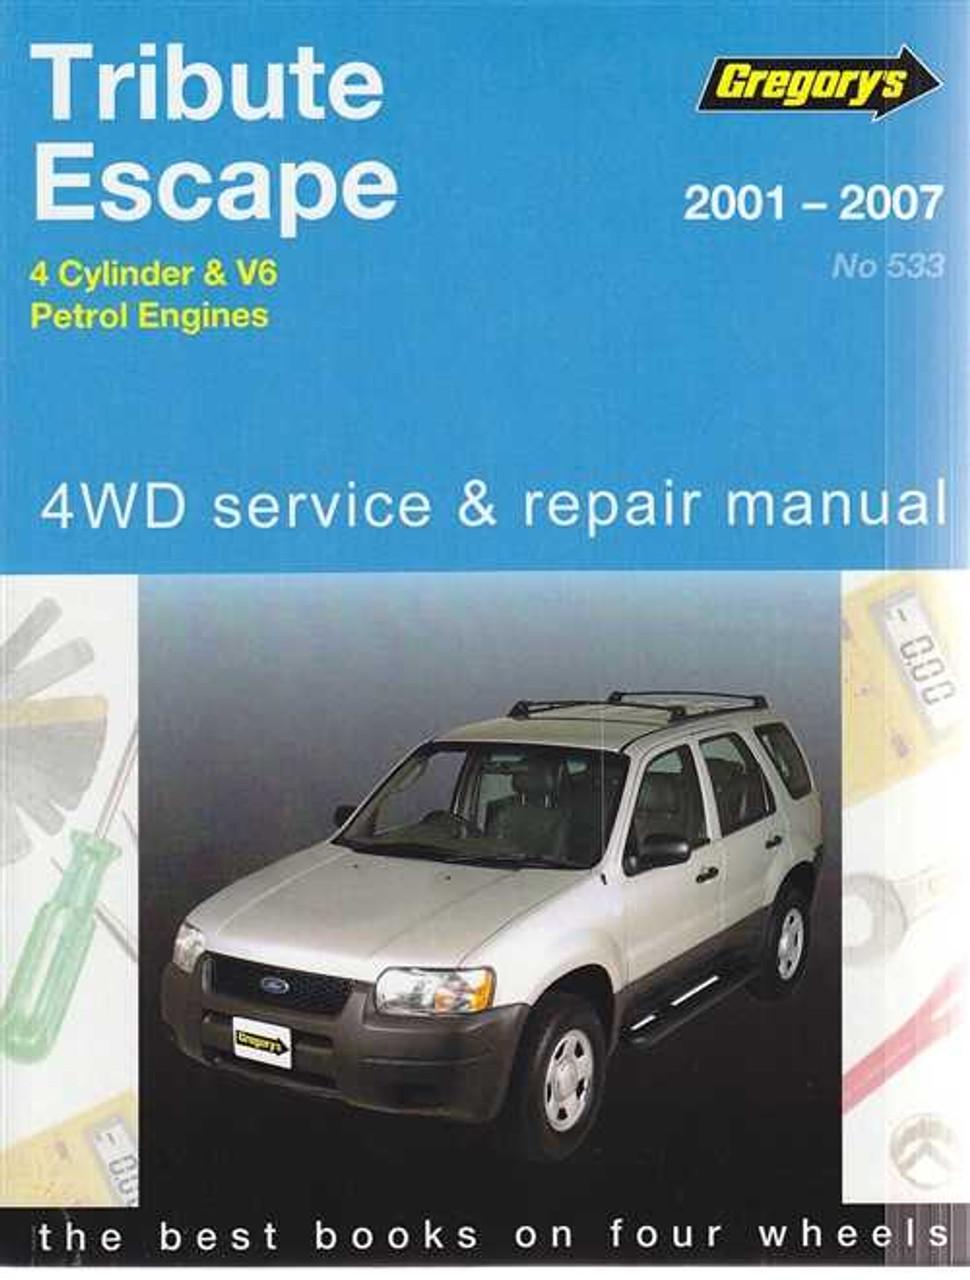 ford tribute and mazda escape petrol 2001 2007 workshop manual rh automotobookshop com au 2005 Ford Escape 2011 Ford Escape